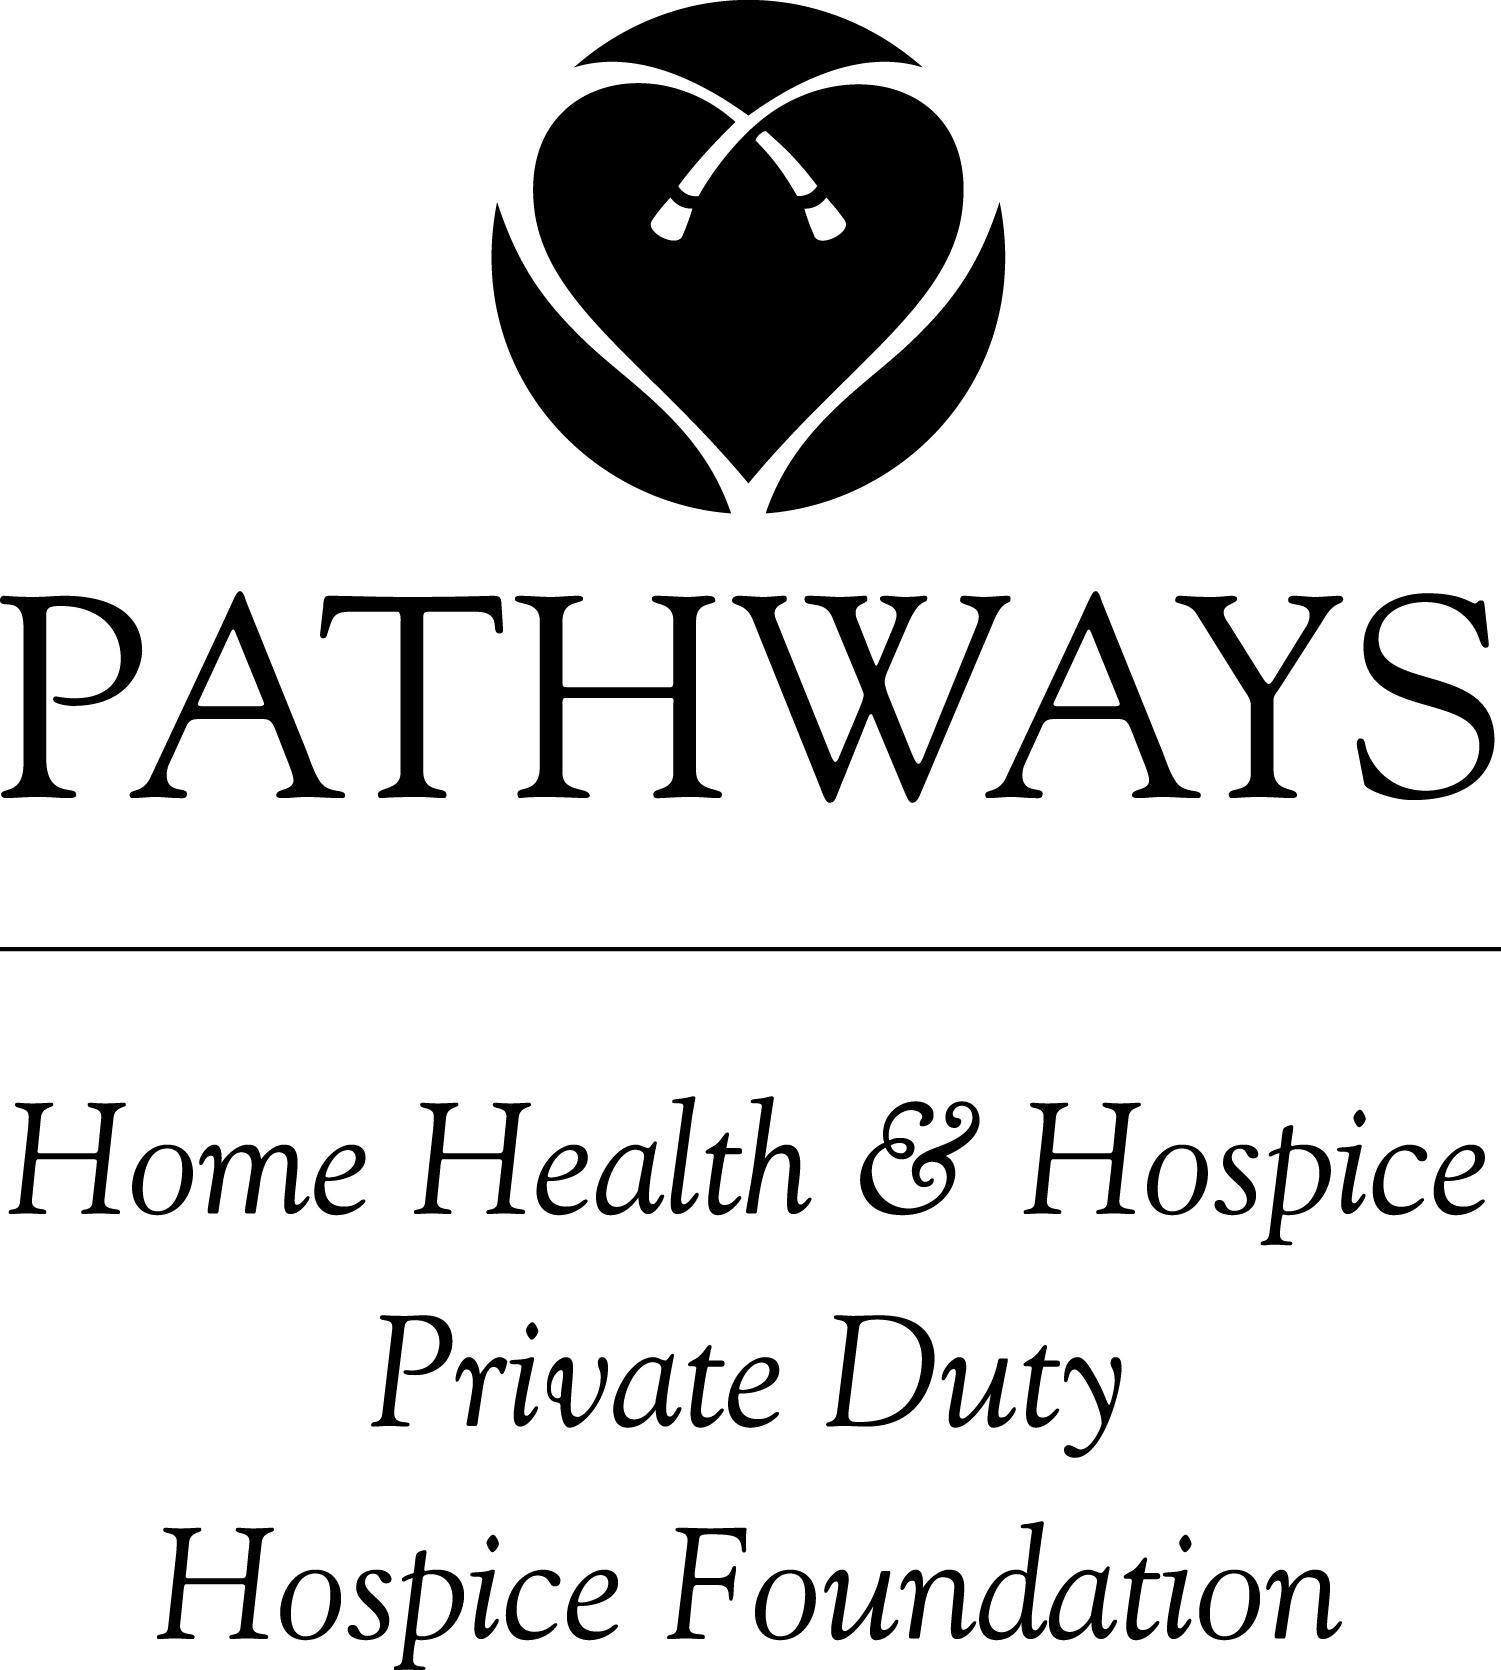 Pathways Home Health & Hospice Hires Ronda Macchello as